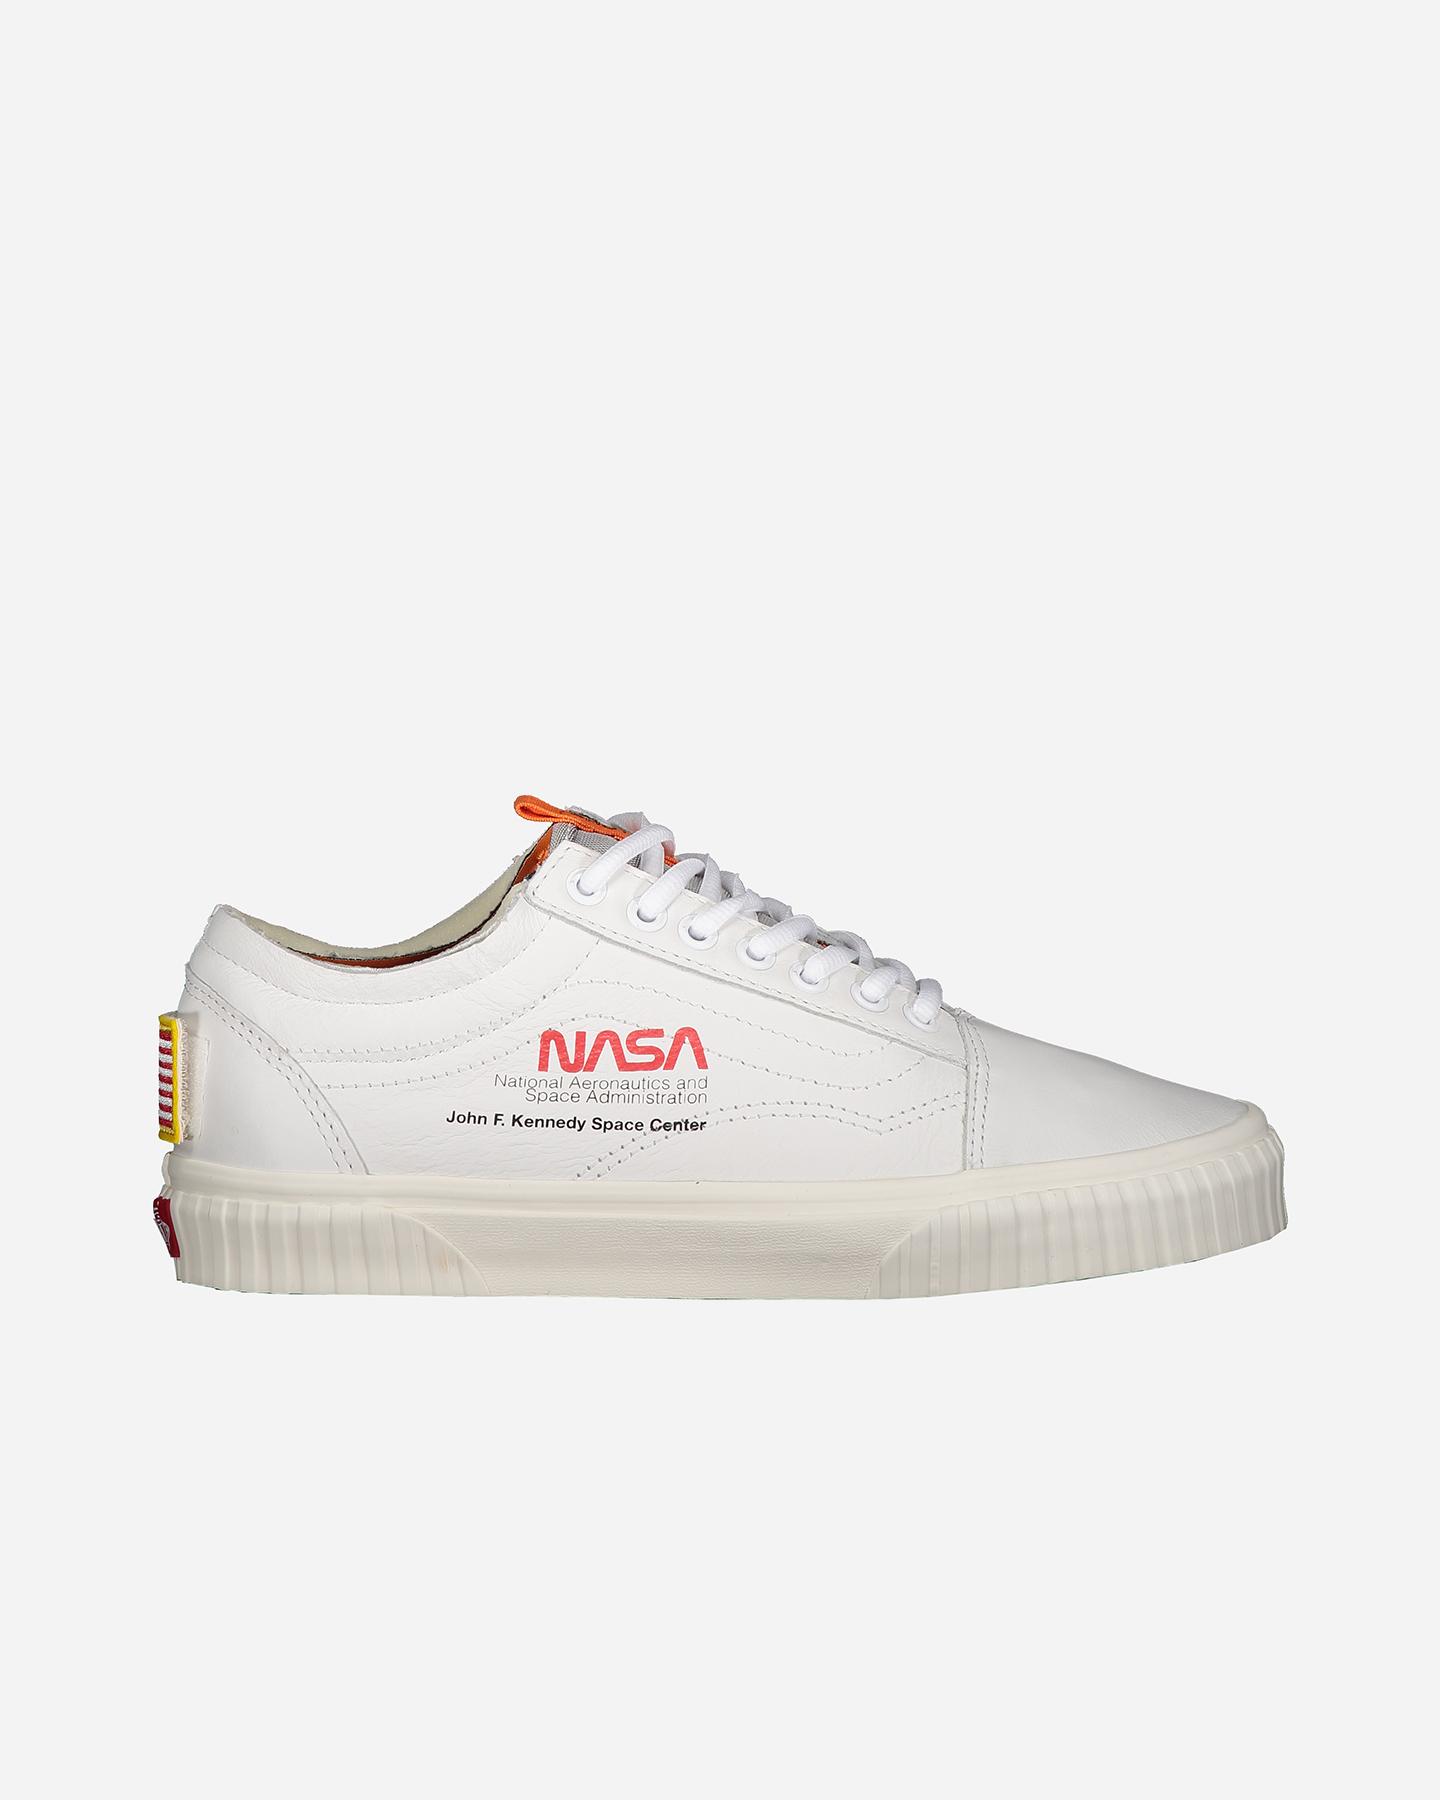 Scarpe Sport Skool Sneakers Cisalfa Nasa Su M Old Vans Vn0a38g1up91 zMjLqVSUpG